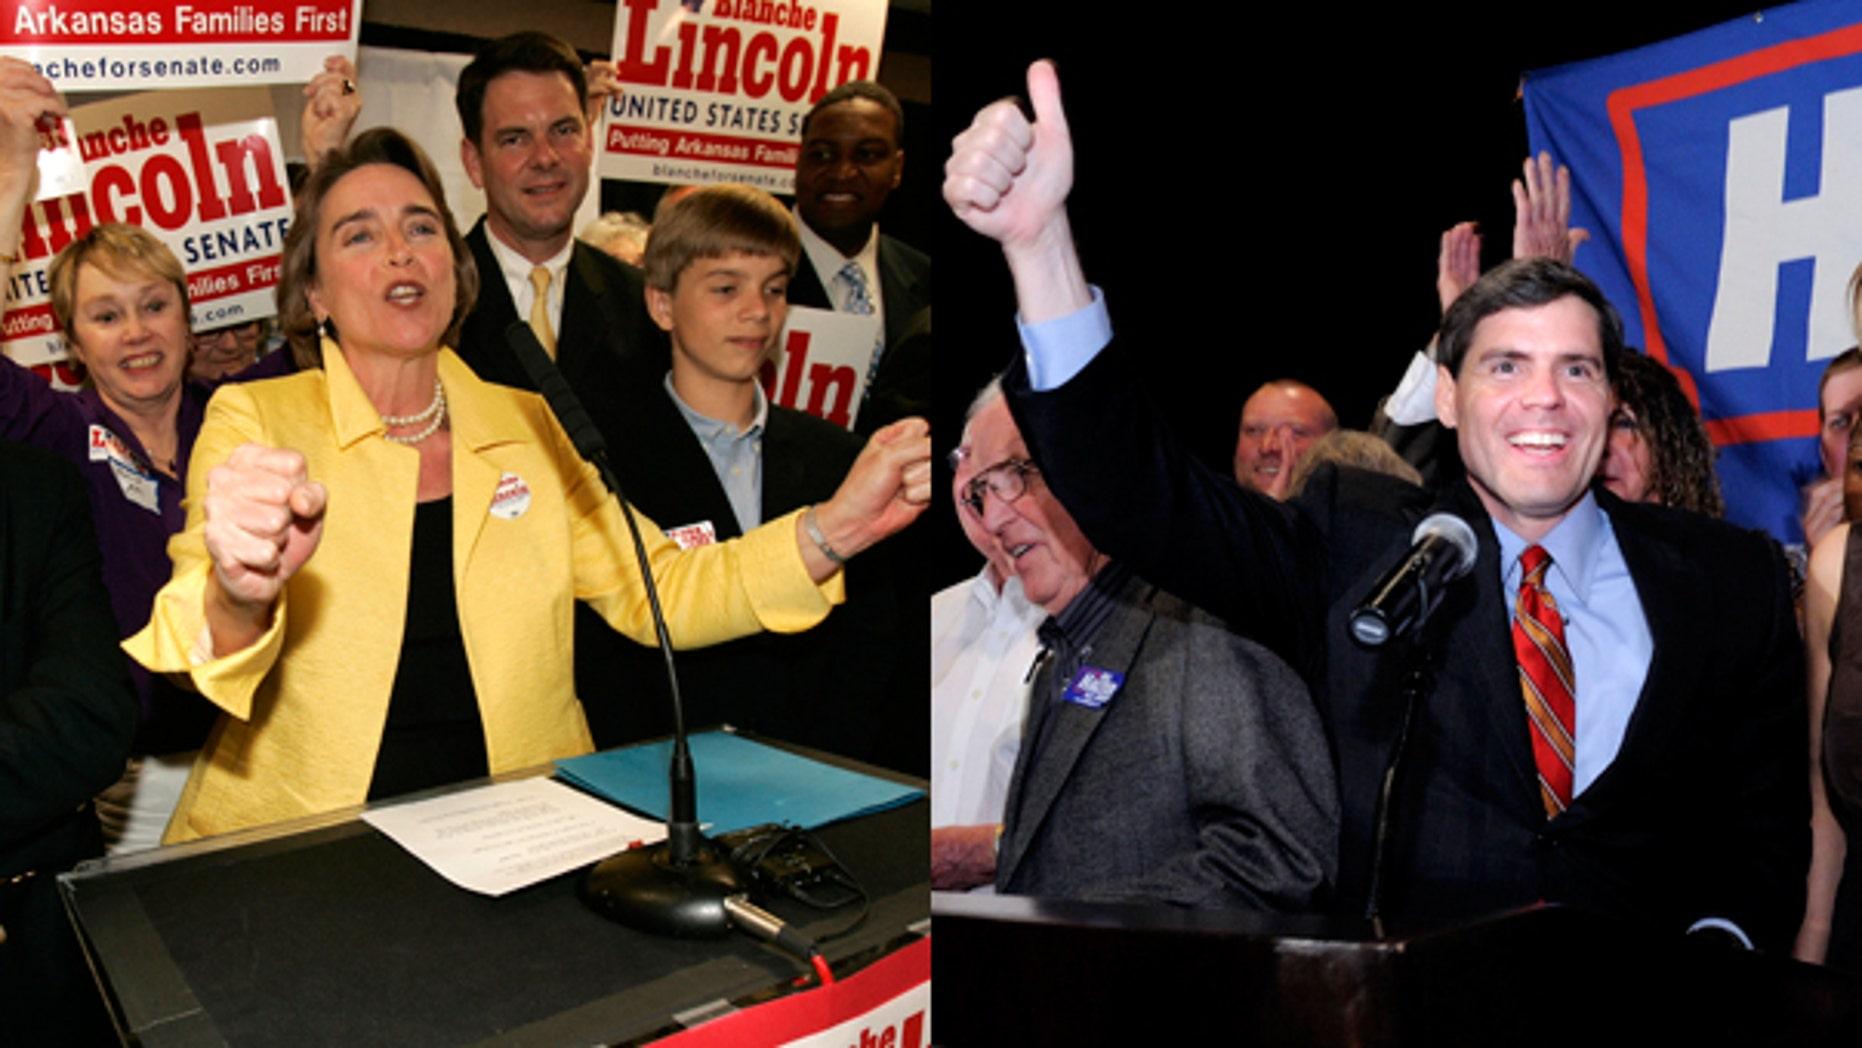 Sen. Blanche Lincoln, D-Ark., and Arkansas Lt. Governor Bill Halter. (AP)